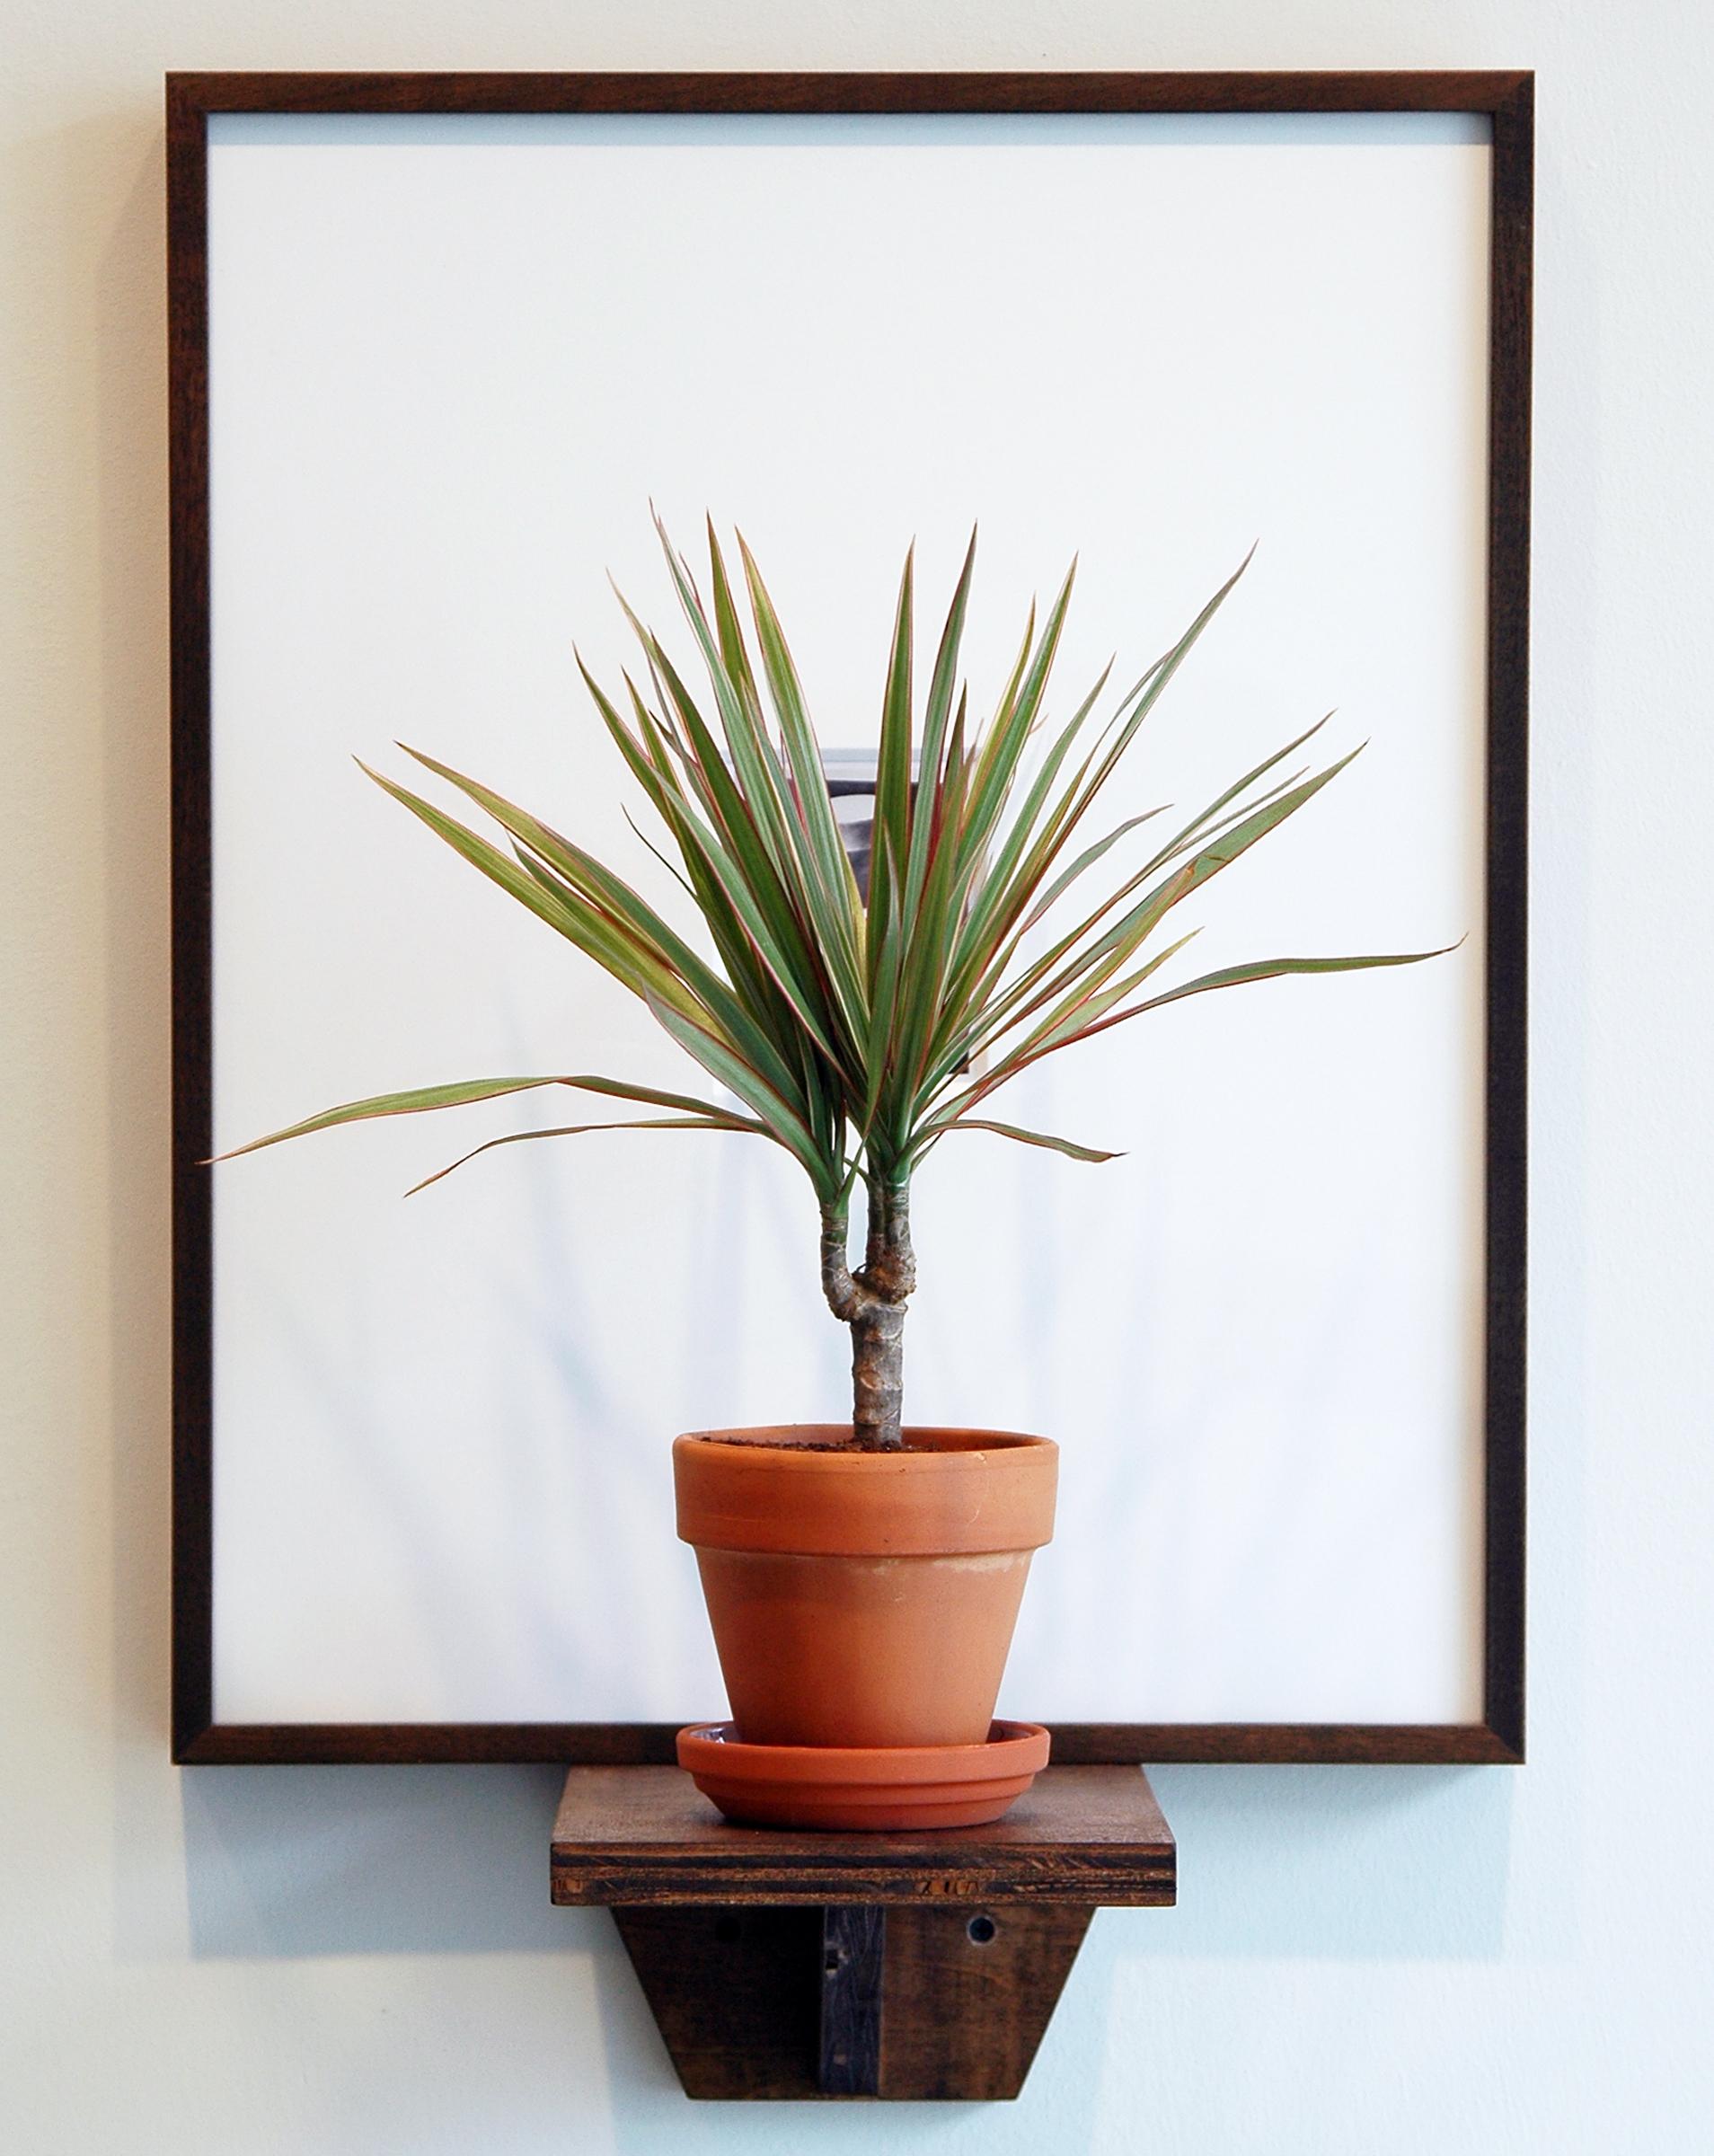 "JOSHUA PIEPER   Dead and Alive (W.C.) , framed archival Polaroid, shelf, tri-colored dresena plant, 24.5"" x 16.25"" x 9.75"", 2012"